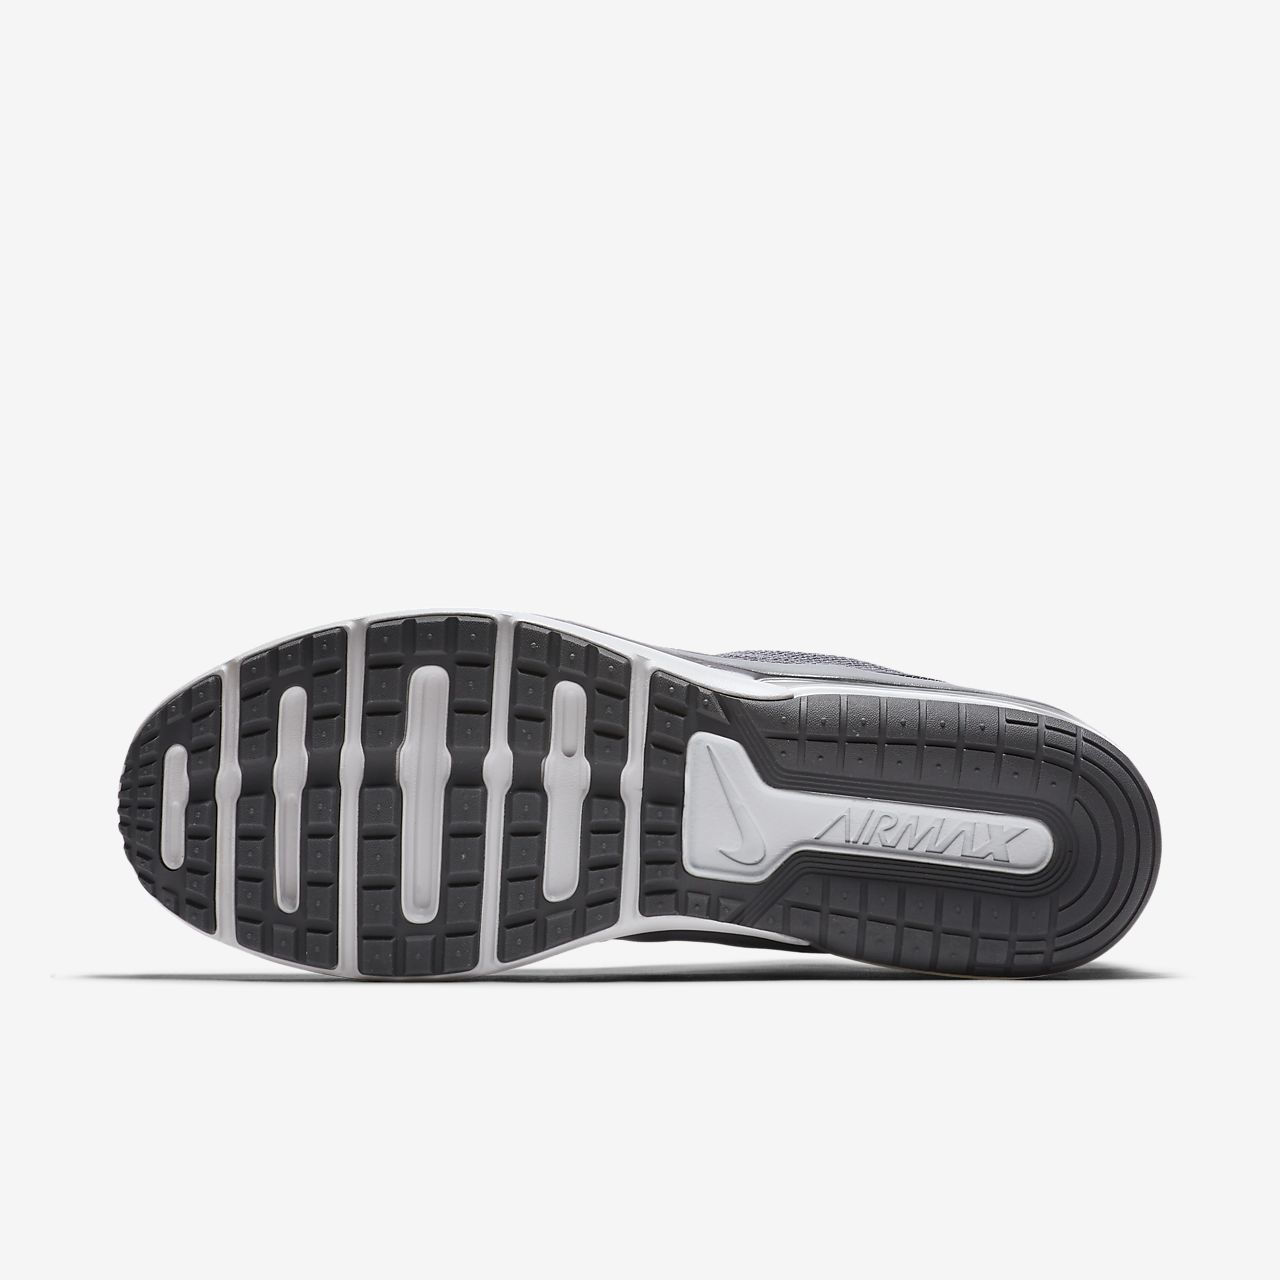 31bf610e Мужские беговые кроссовки Nike Air Max Fury. Nike.com RU